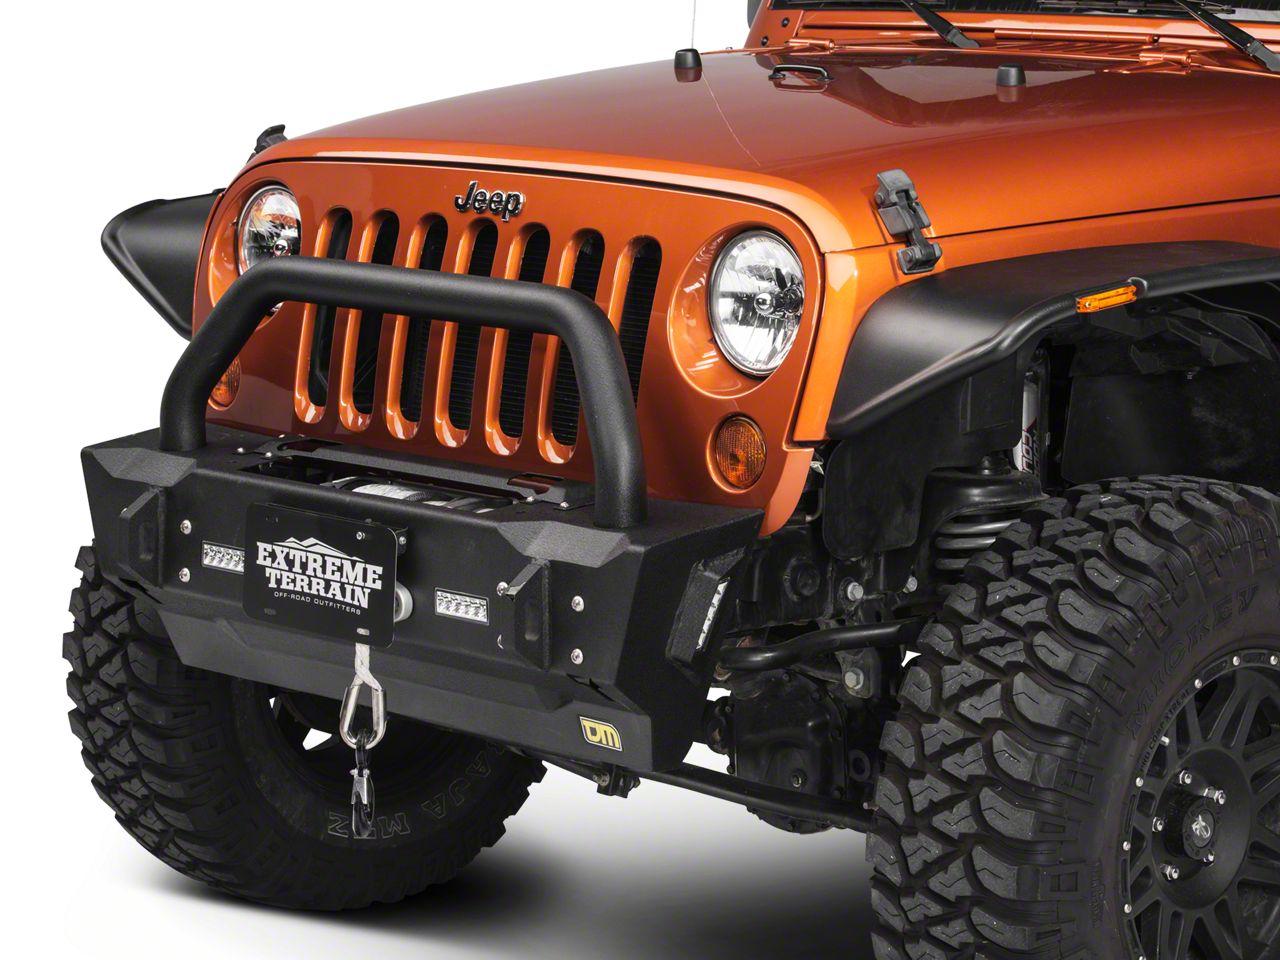 TJM Rock Krawler Front Bumper w/ LED Lighting (07-18 Jeep Wrangler JK)